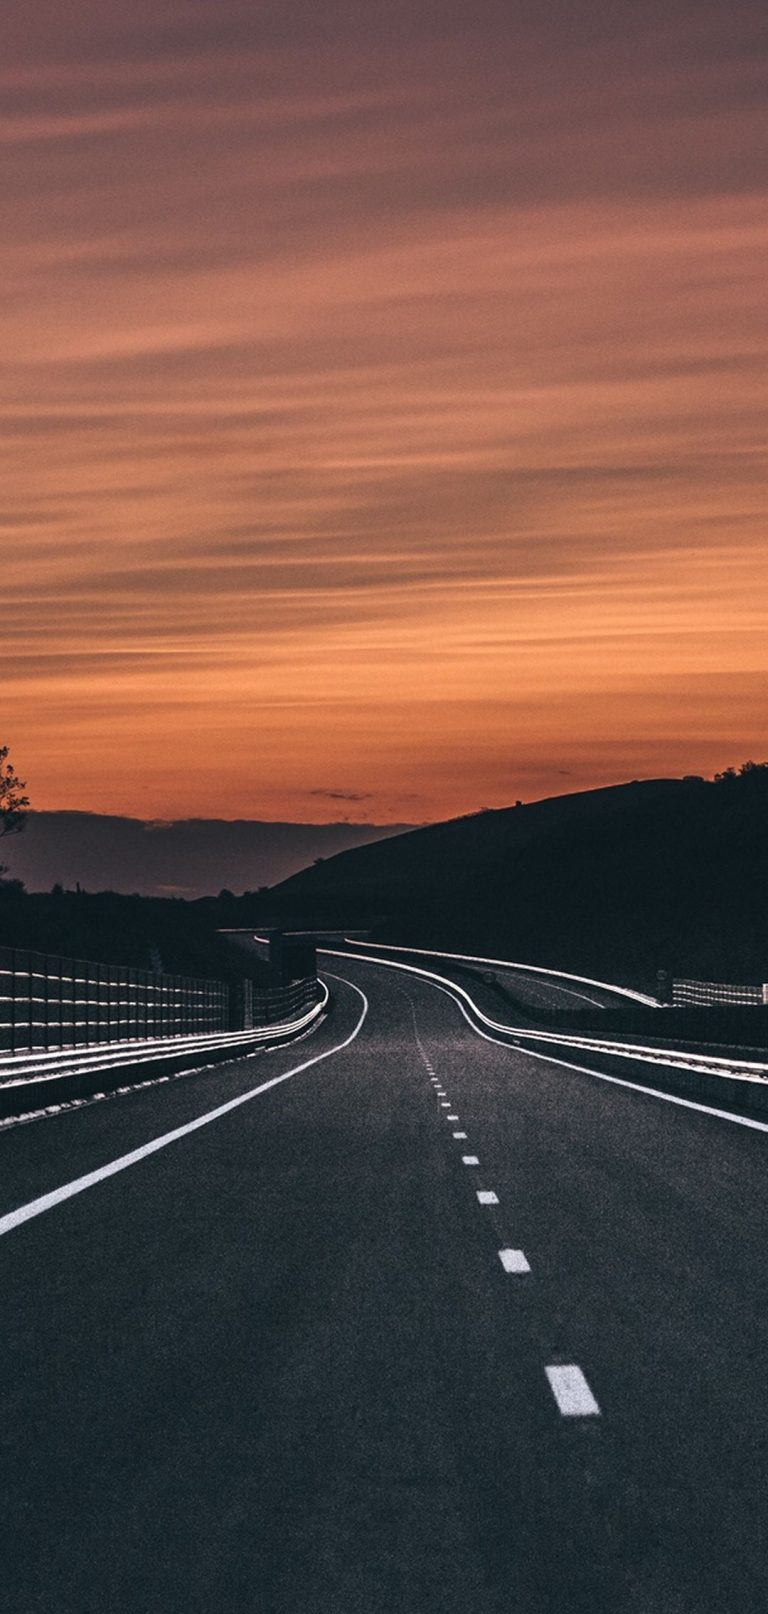 Road Marking Asphalt 1080x2270 768x1614